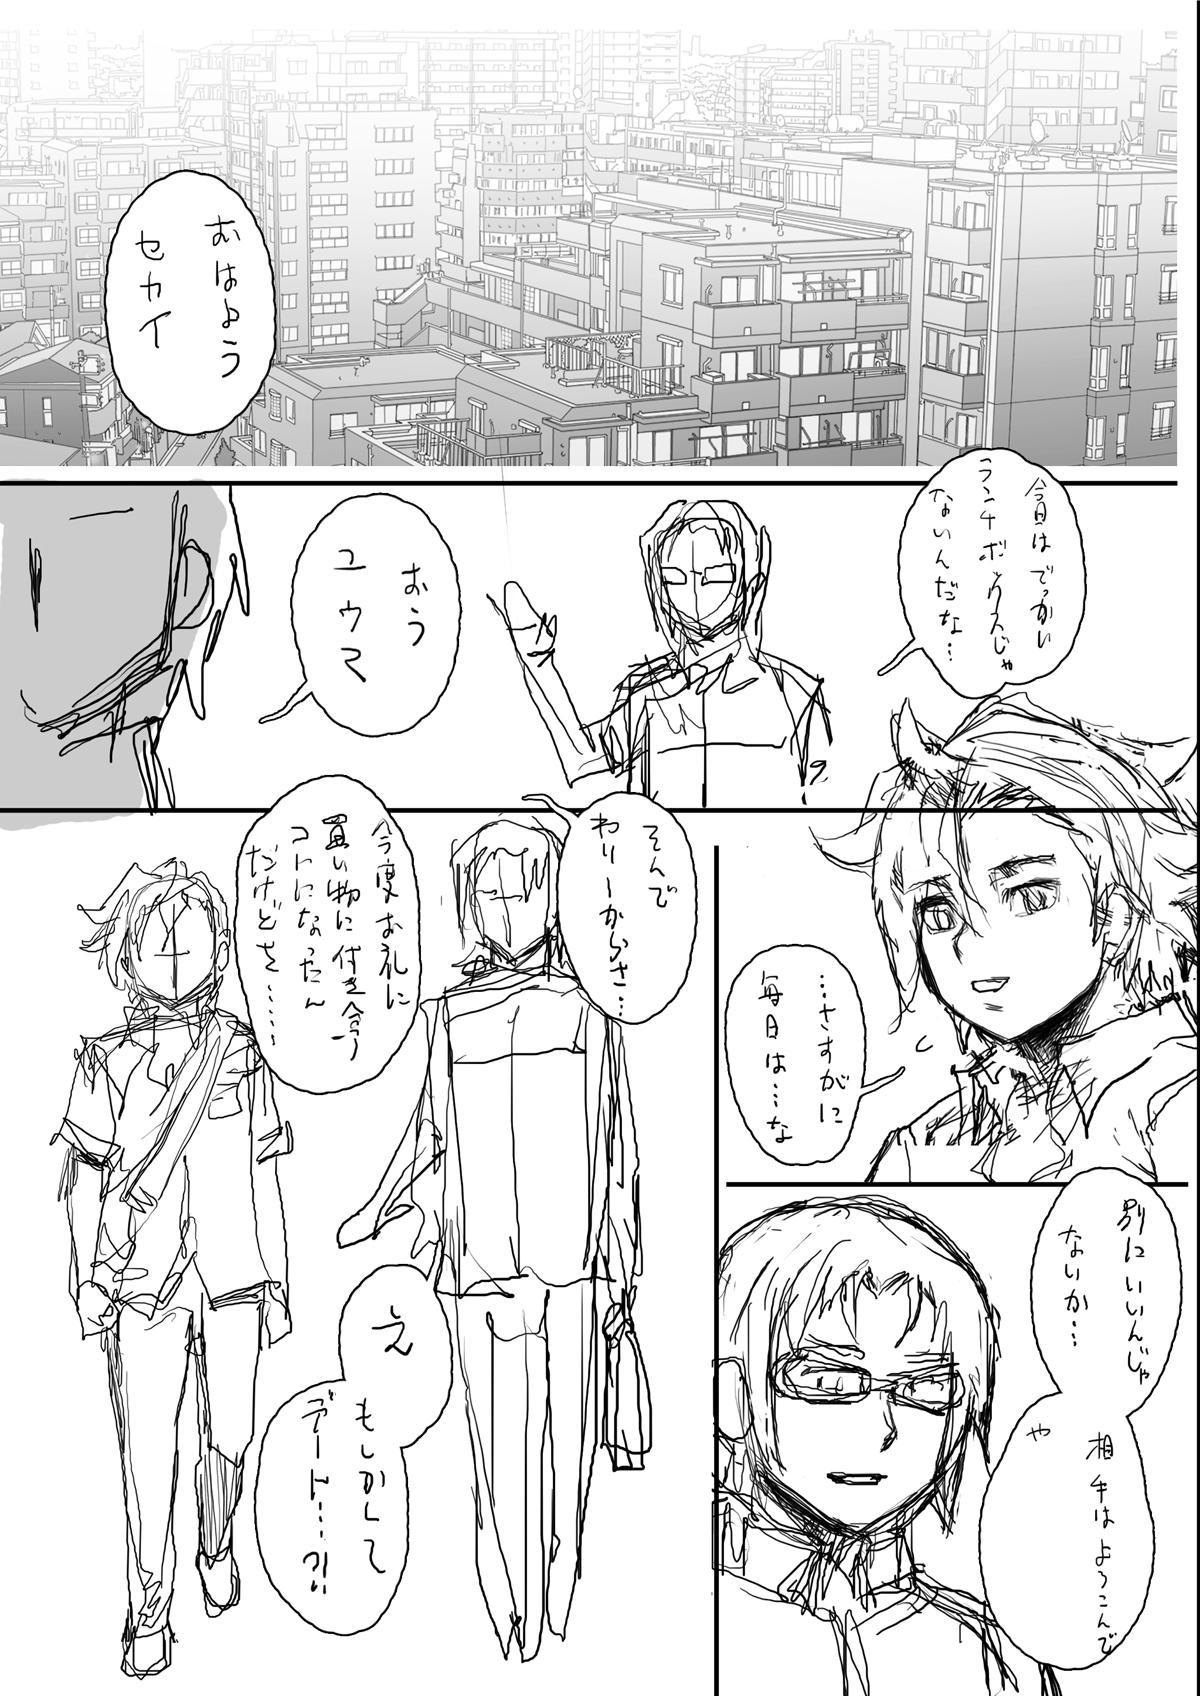 [Studio Tapa Tapa (Sengoku-kun)] Daddy-Long-Legs #2 (Gundam Build Fighters Try) [Digital] 61